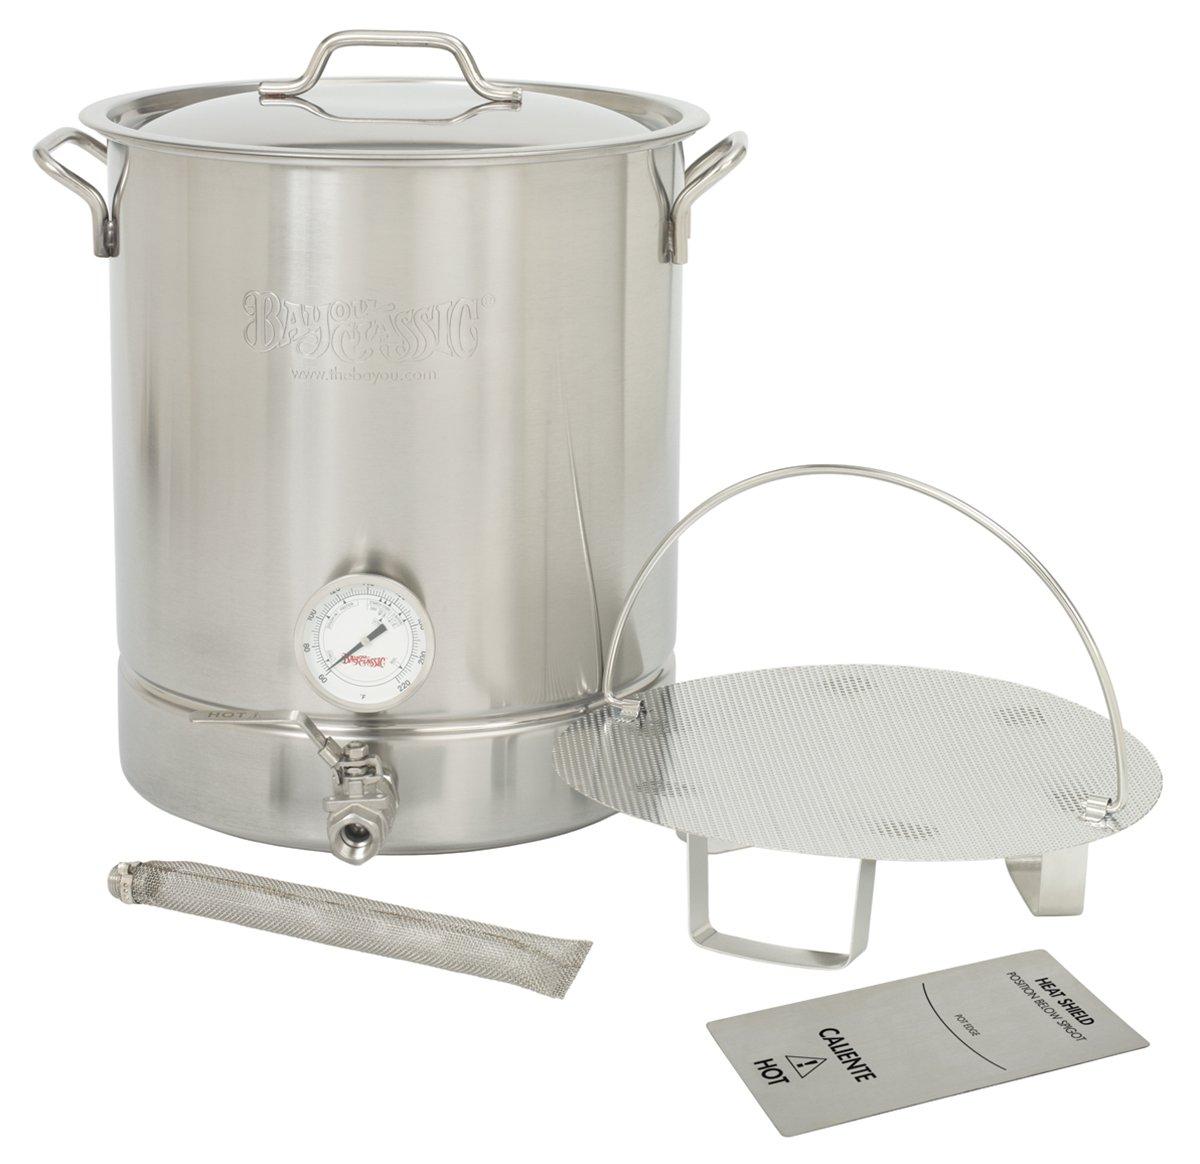 Bayou Classic 800-408 - 8-Gal Premium Brew Kettle, 6-Pc Set by Bayou Classic